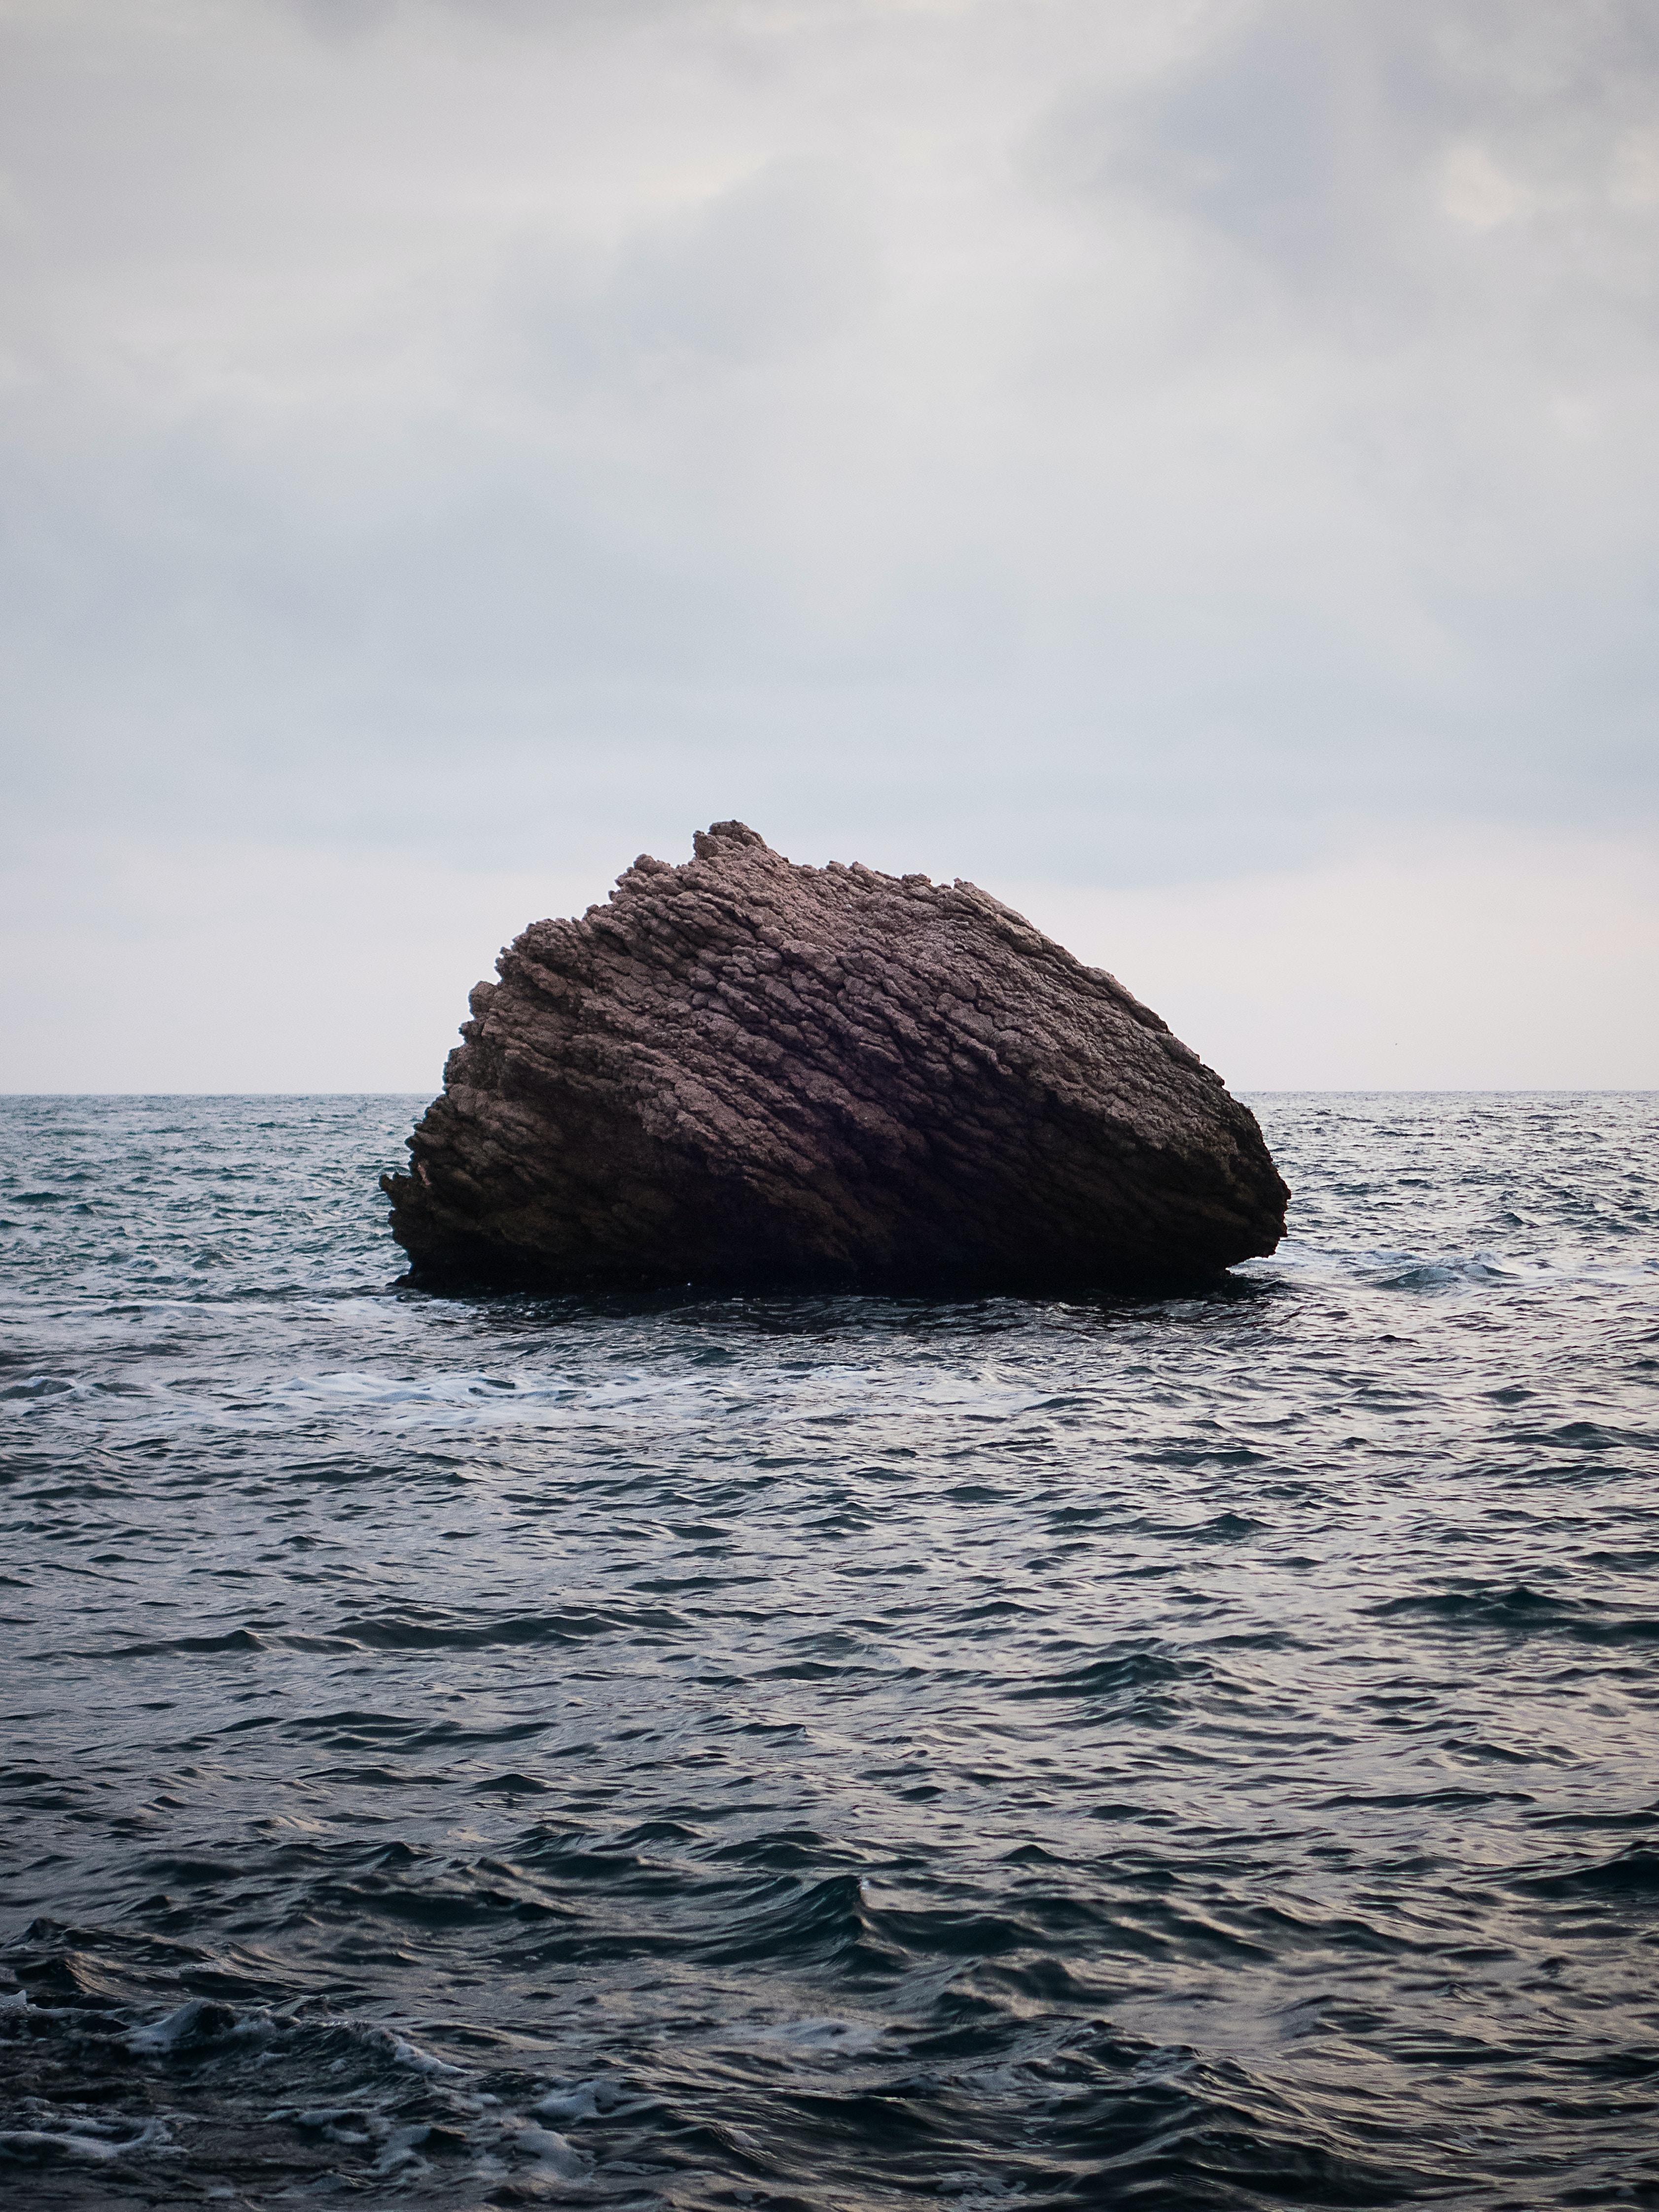 brown boulder on water